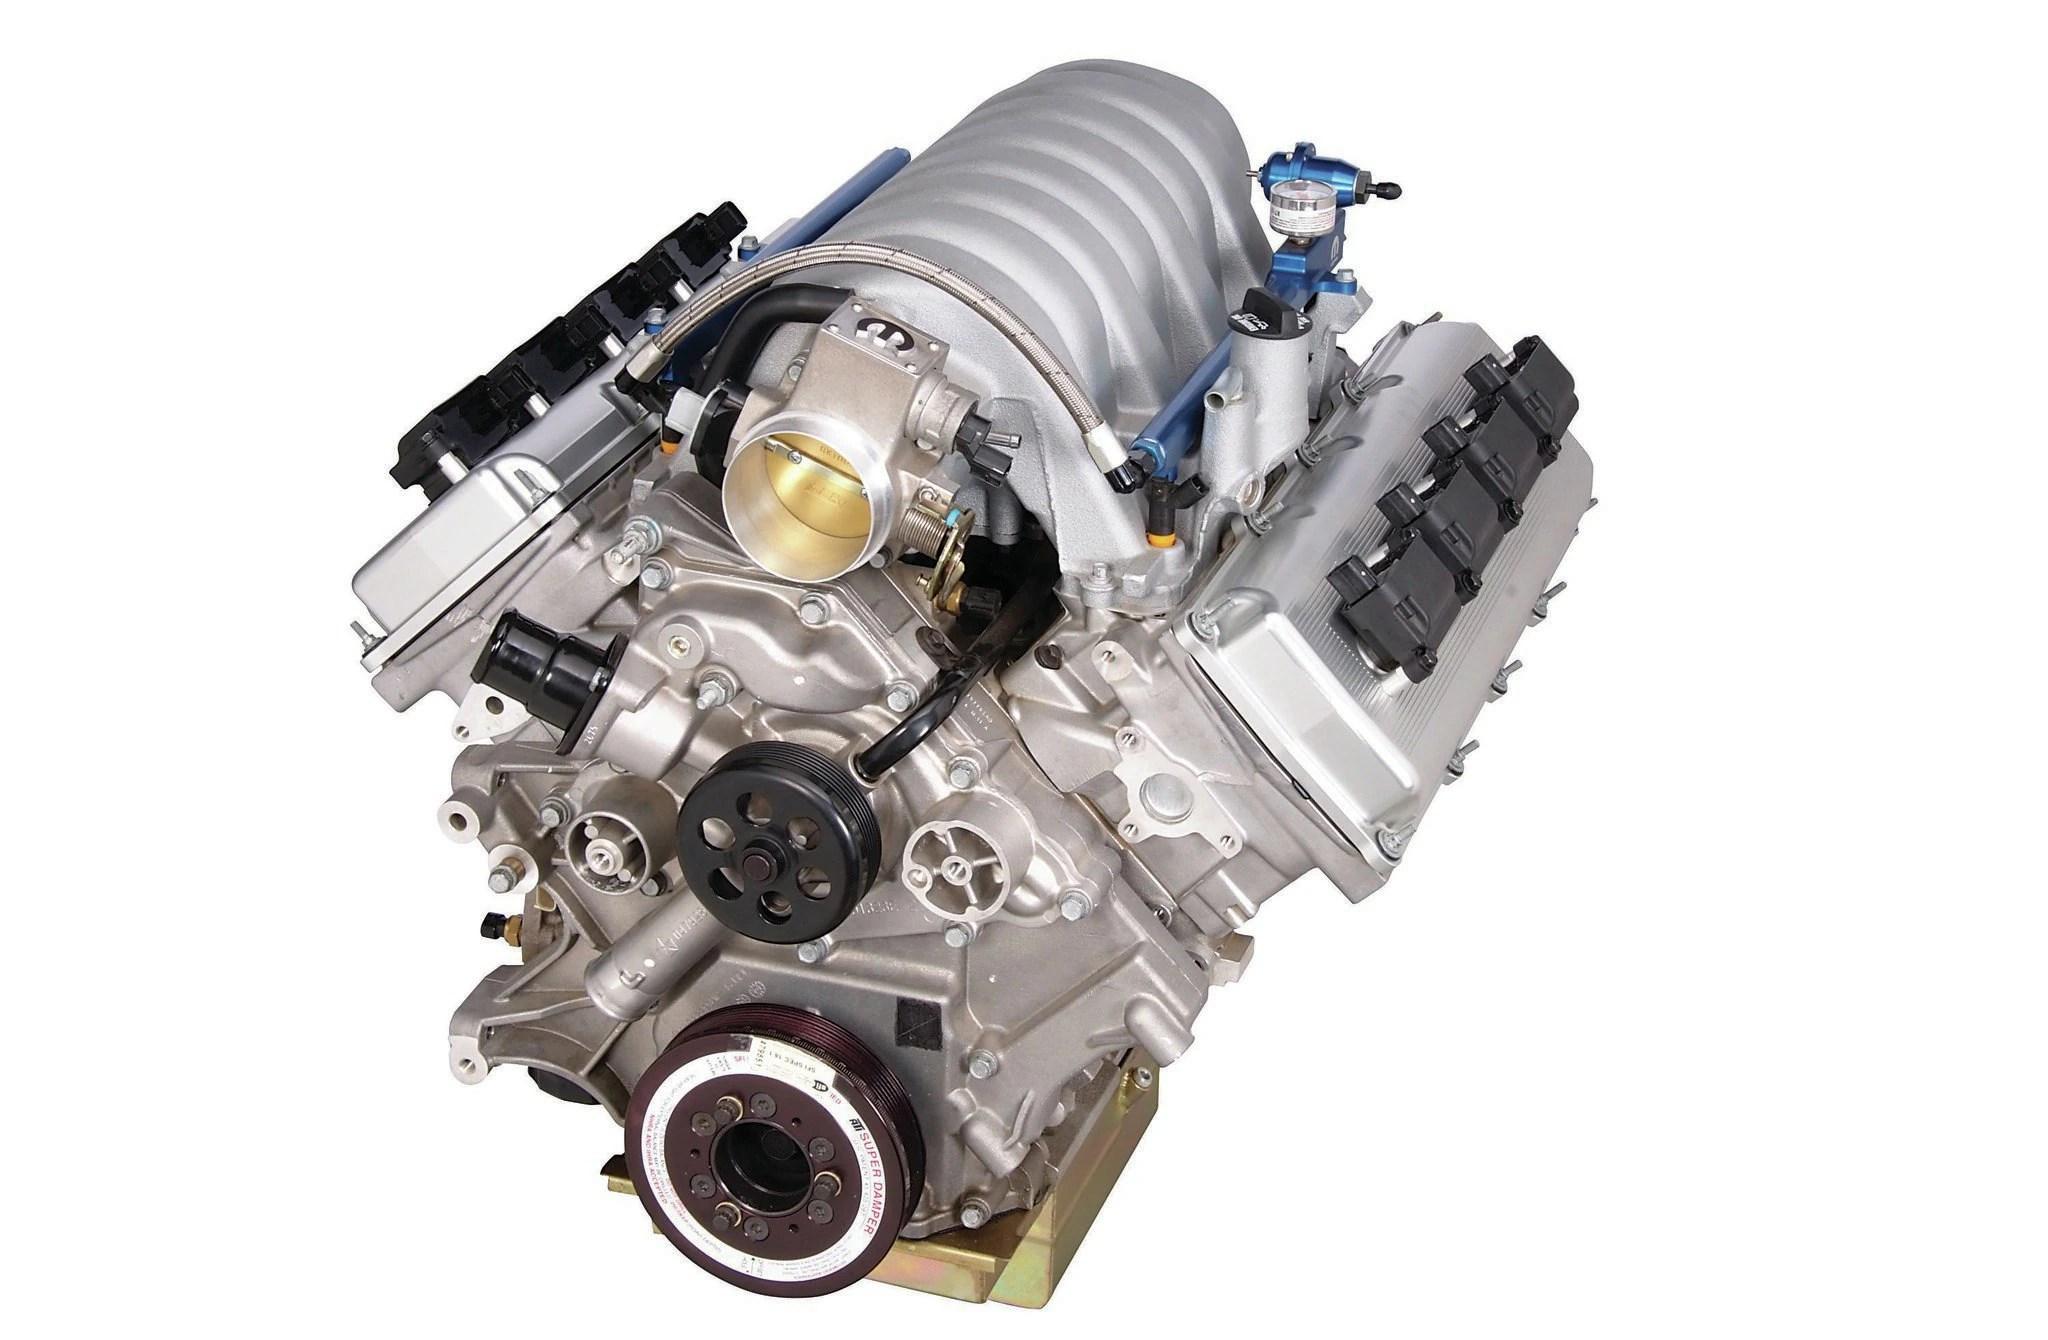 5 7 hemi engine diagram oil change blog wiring diagramjeep 5 7 hemi engine diagram all wiring diagram 2005 dodge ram 1500 4x4 front differential 5 7 hemi engine diagram oil change